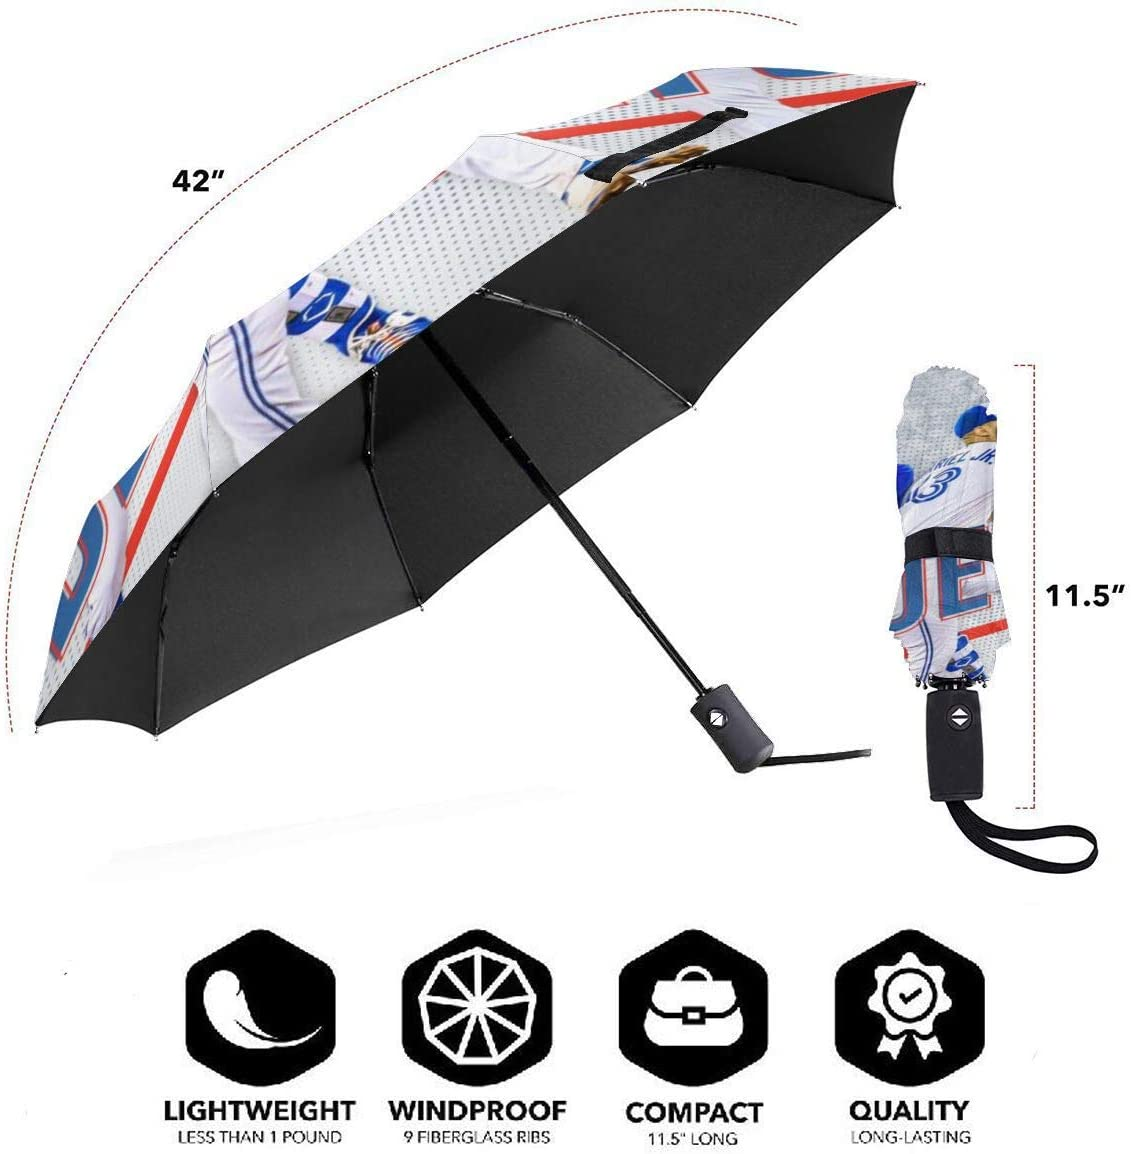 Toron-to Blue Jay-s Compact Auto Open Close Folding Business Umbrellas UV Protection Automatic Tri-fold Umbrella for Men and Women Lovesofun Portable Automatic Umbrella